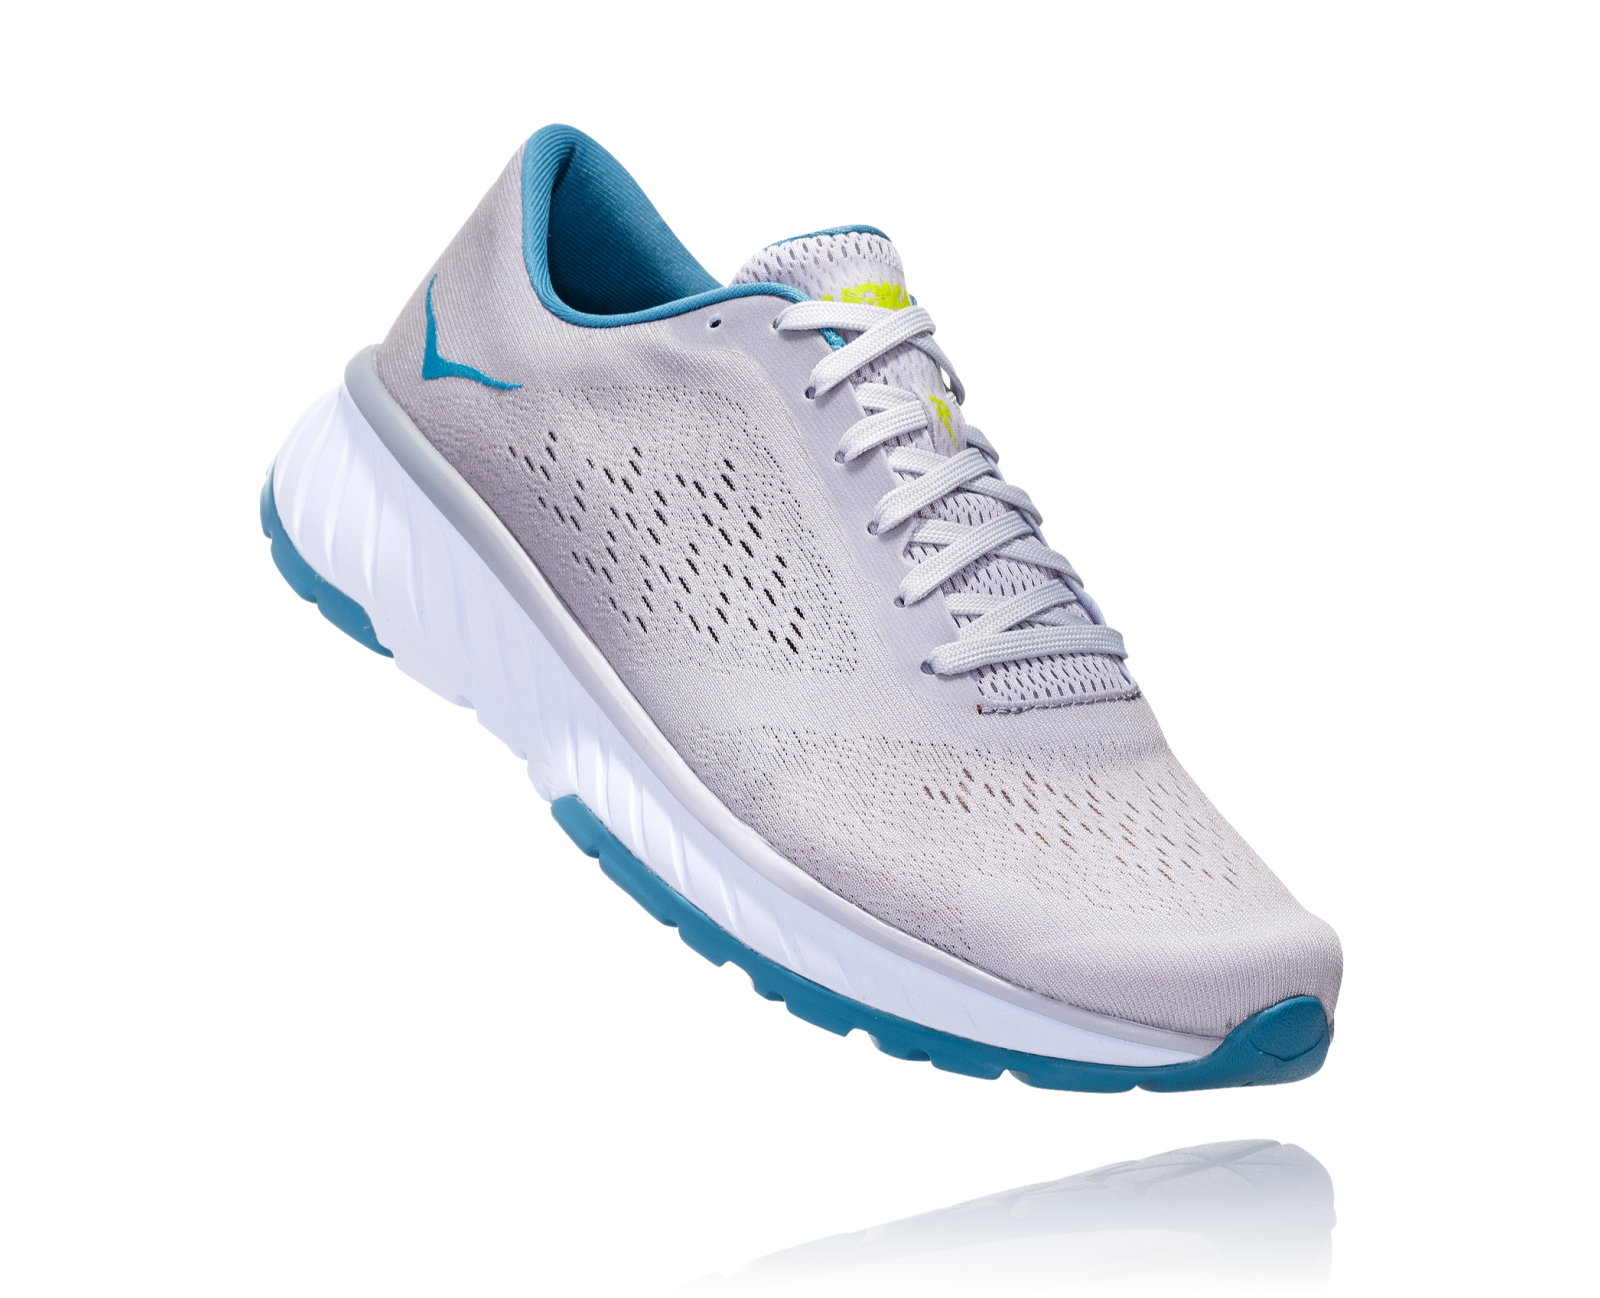 Men's Cavu 2 - Hoka One One Athletic Shoes-Hoka One One